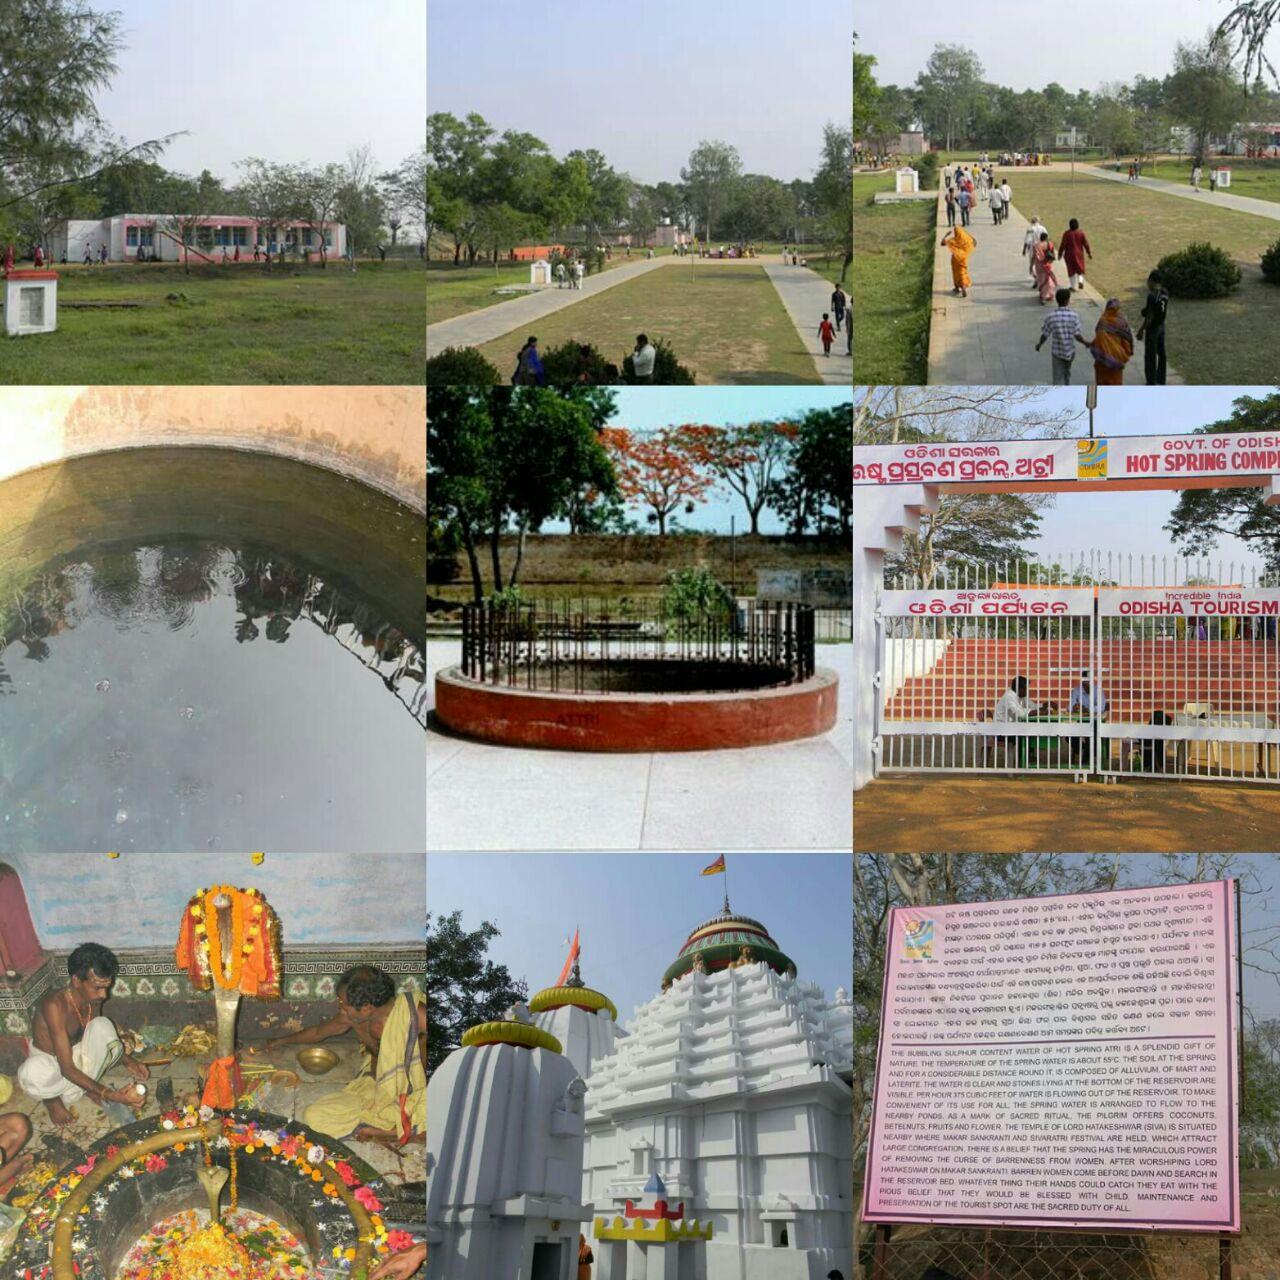 Odiapost hot spring travel destinations in odisha 3